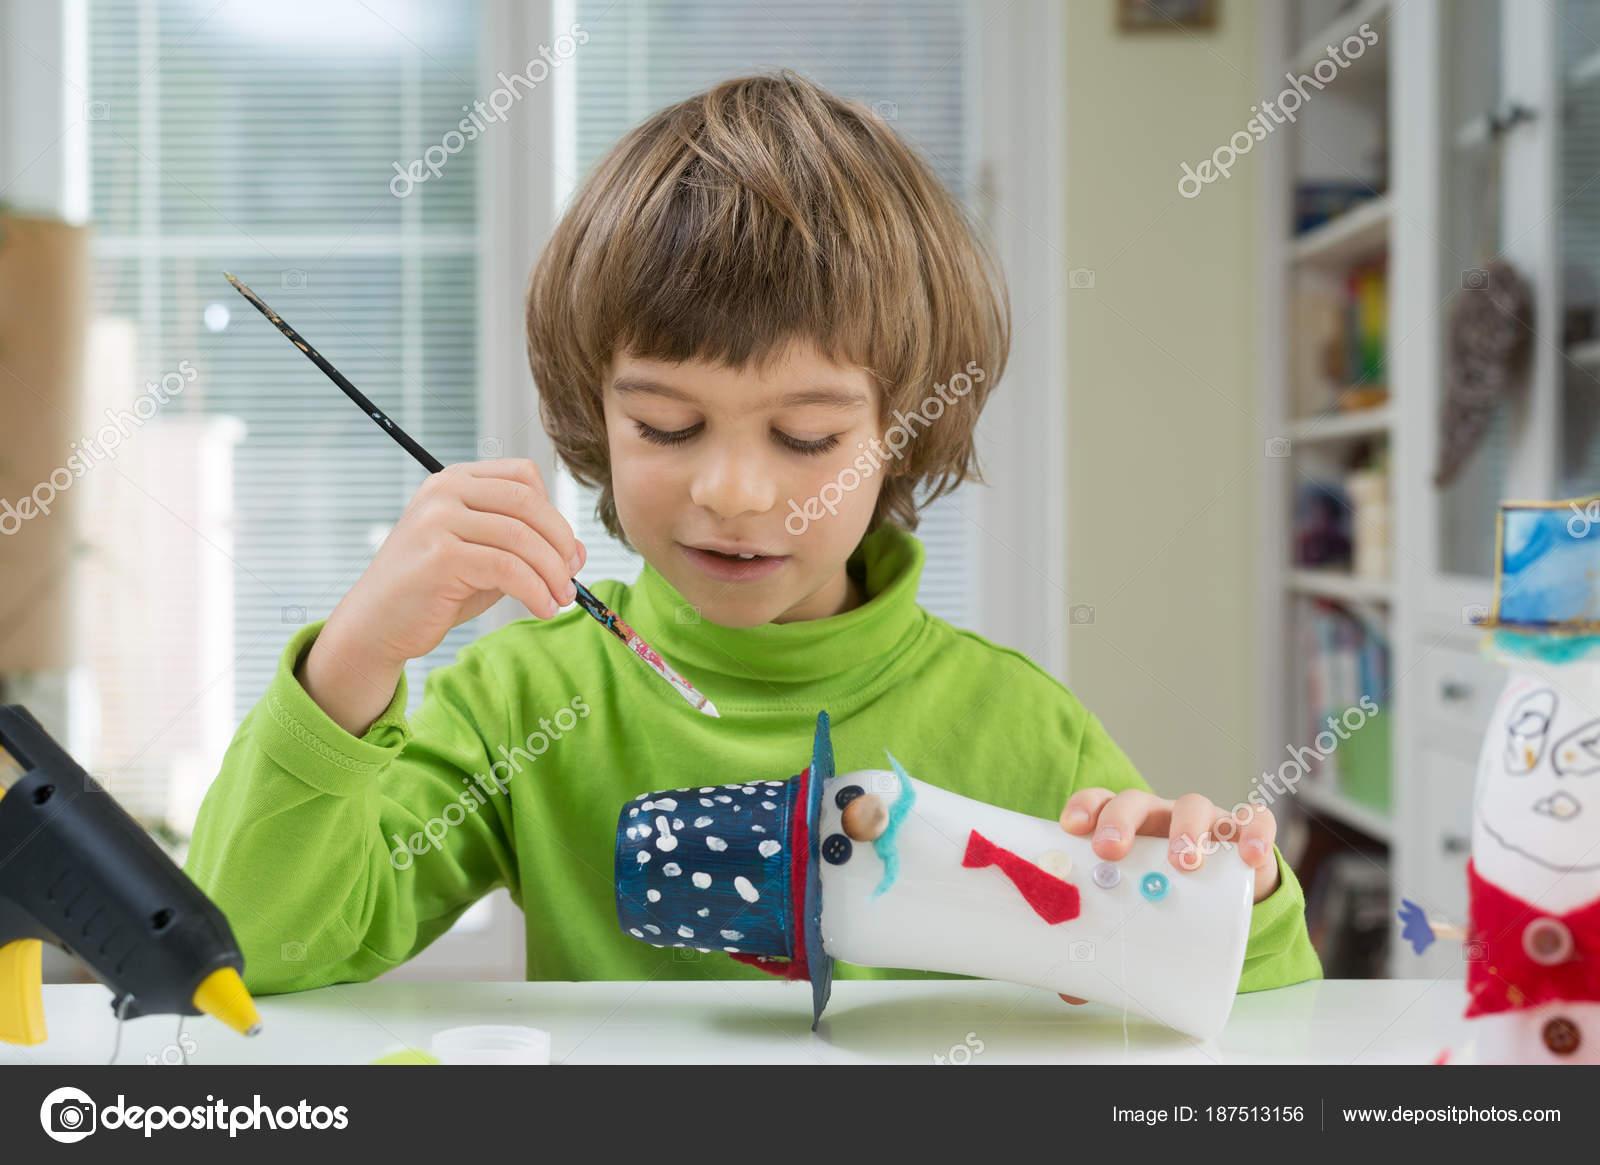 Ser Haciendo Niño Caseros Bricolaje Juguetes Botella Yogurt Creativo drhQst